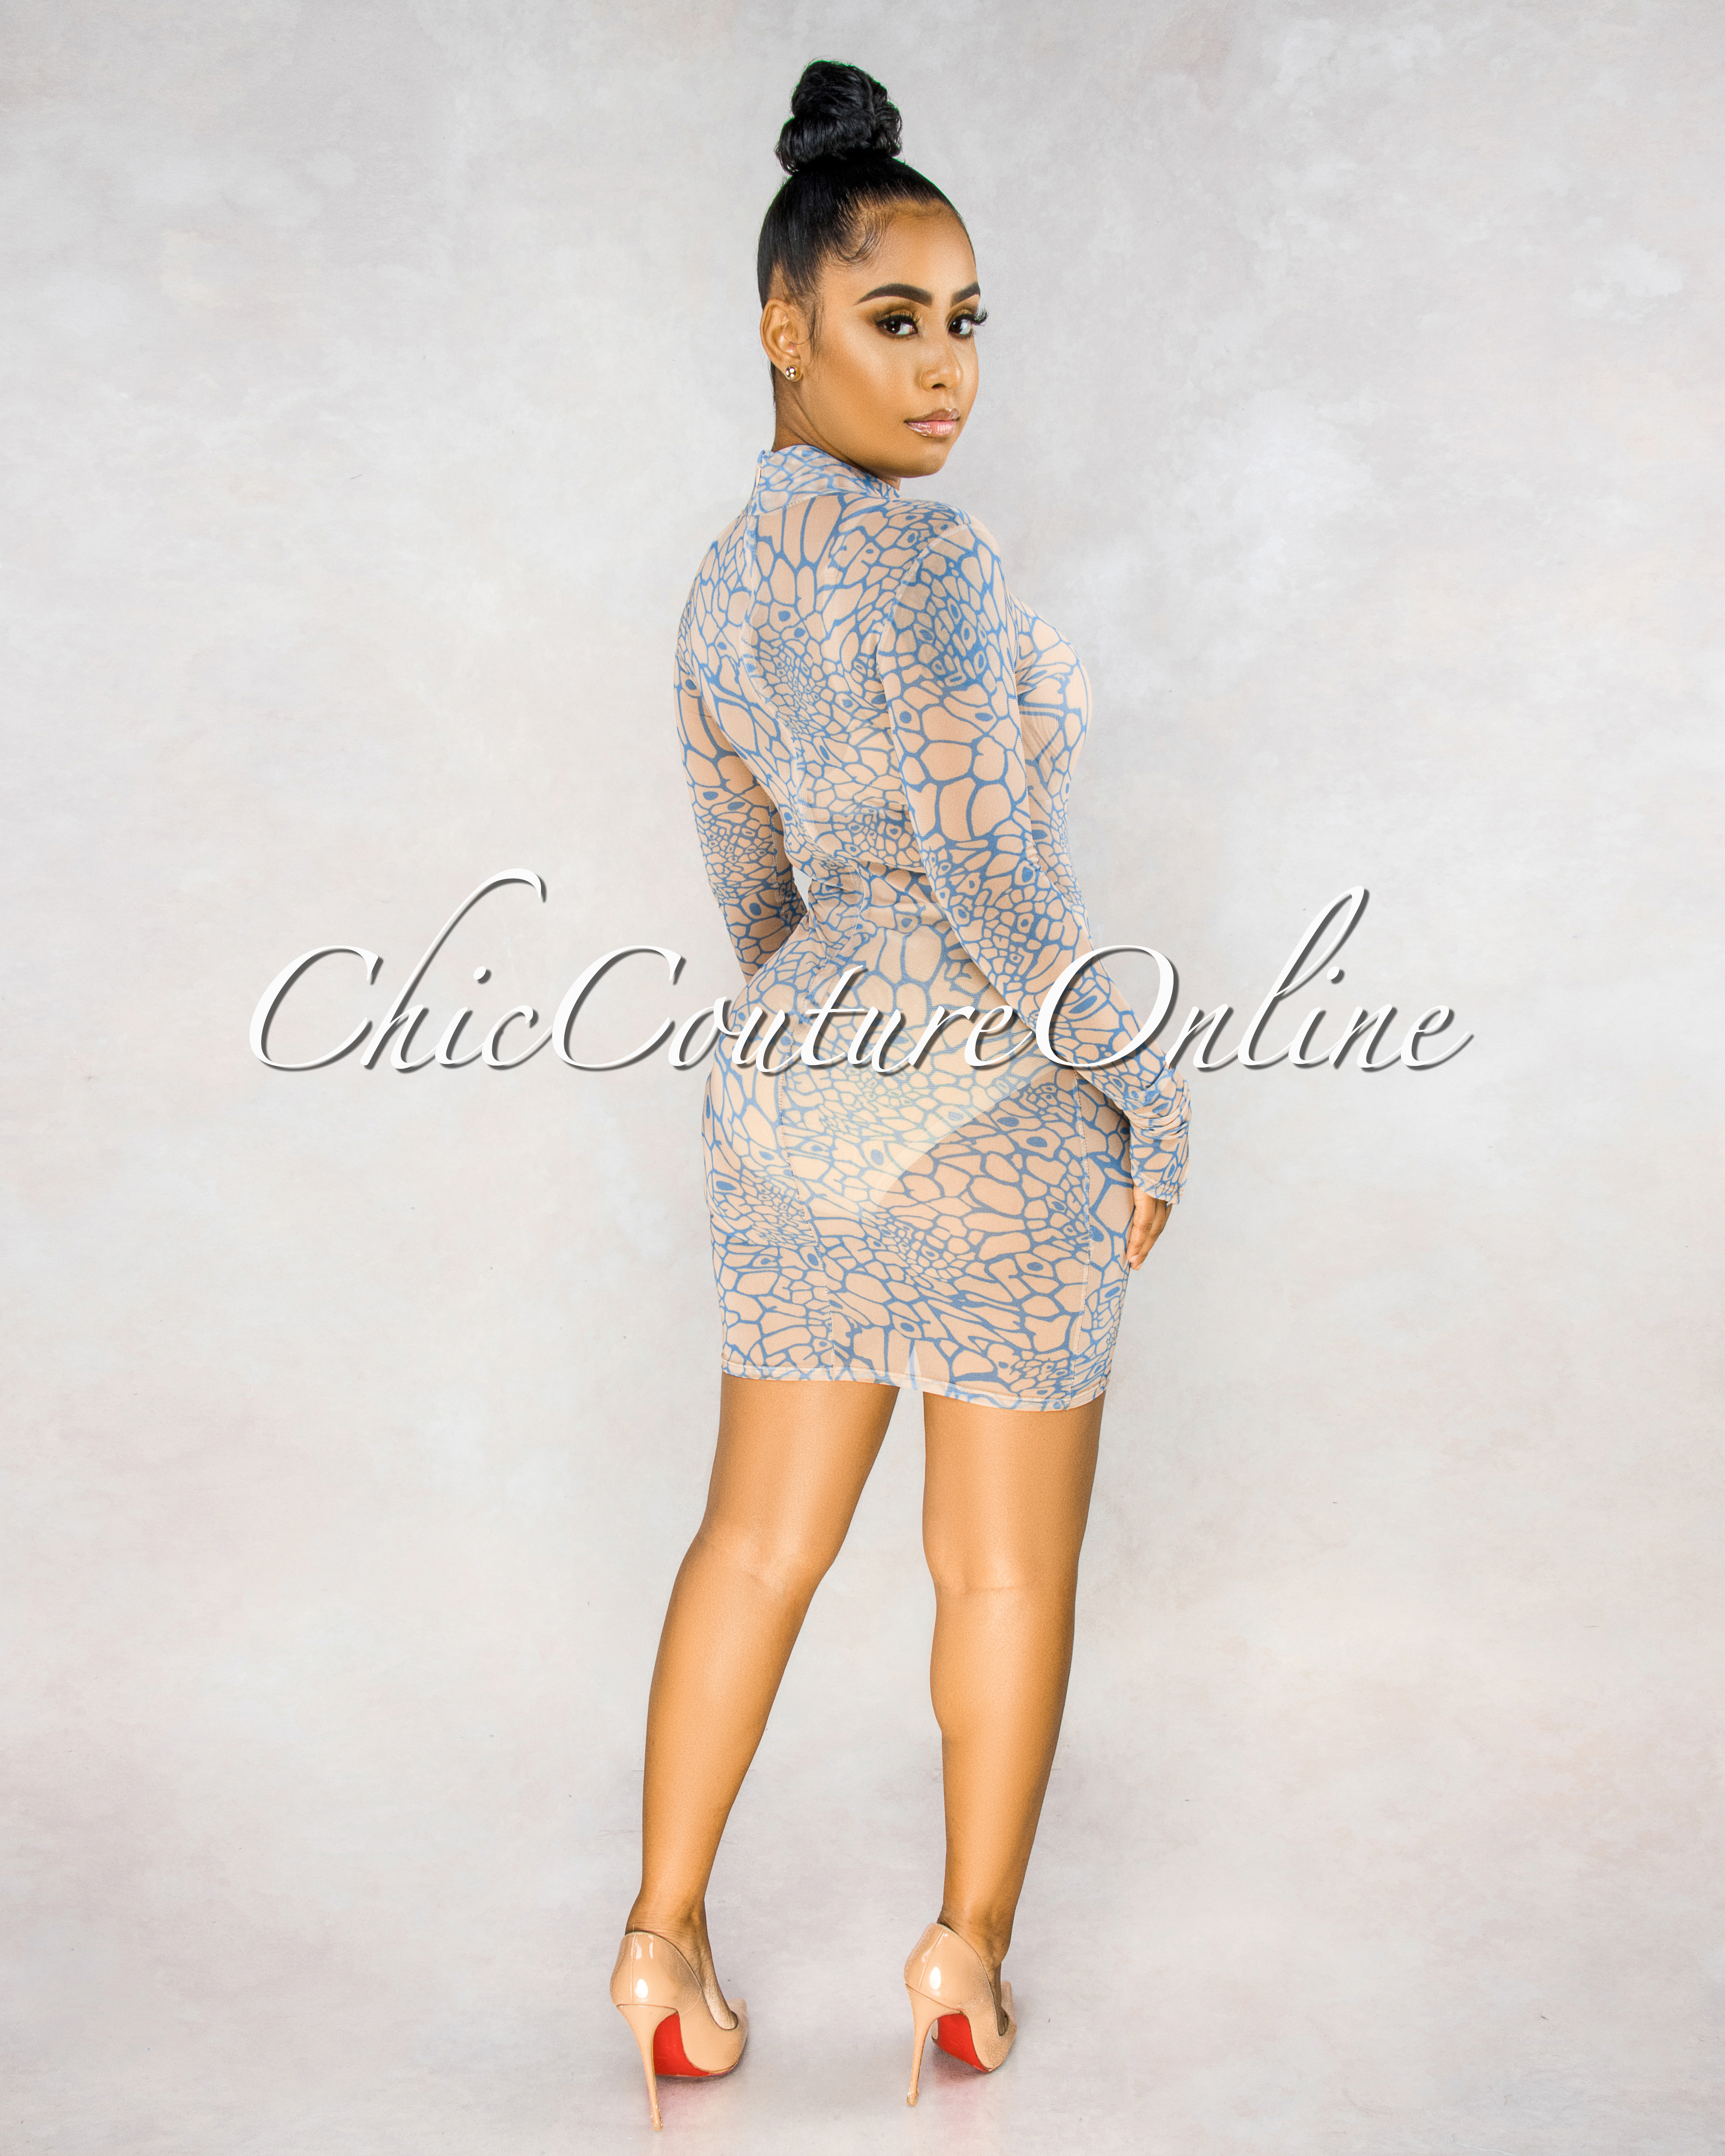 Bauer Nude Turquoise Print Sheer Mesh Long Sleeves Dress